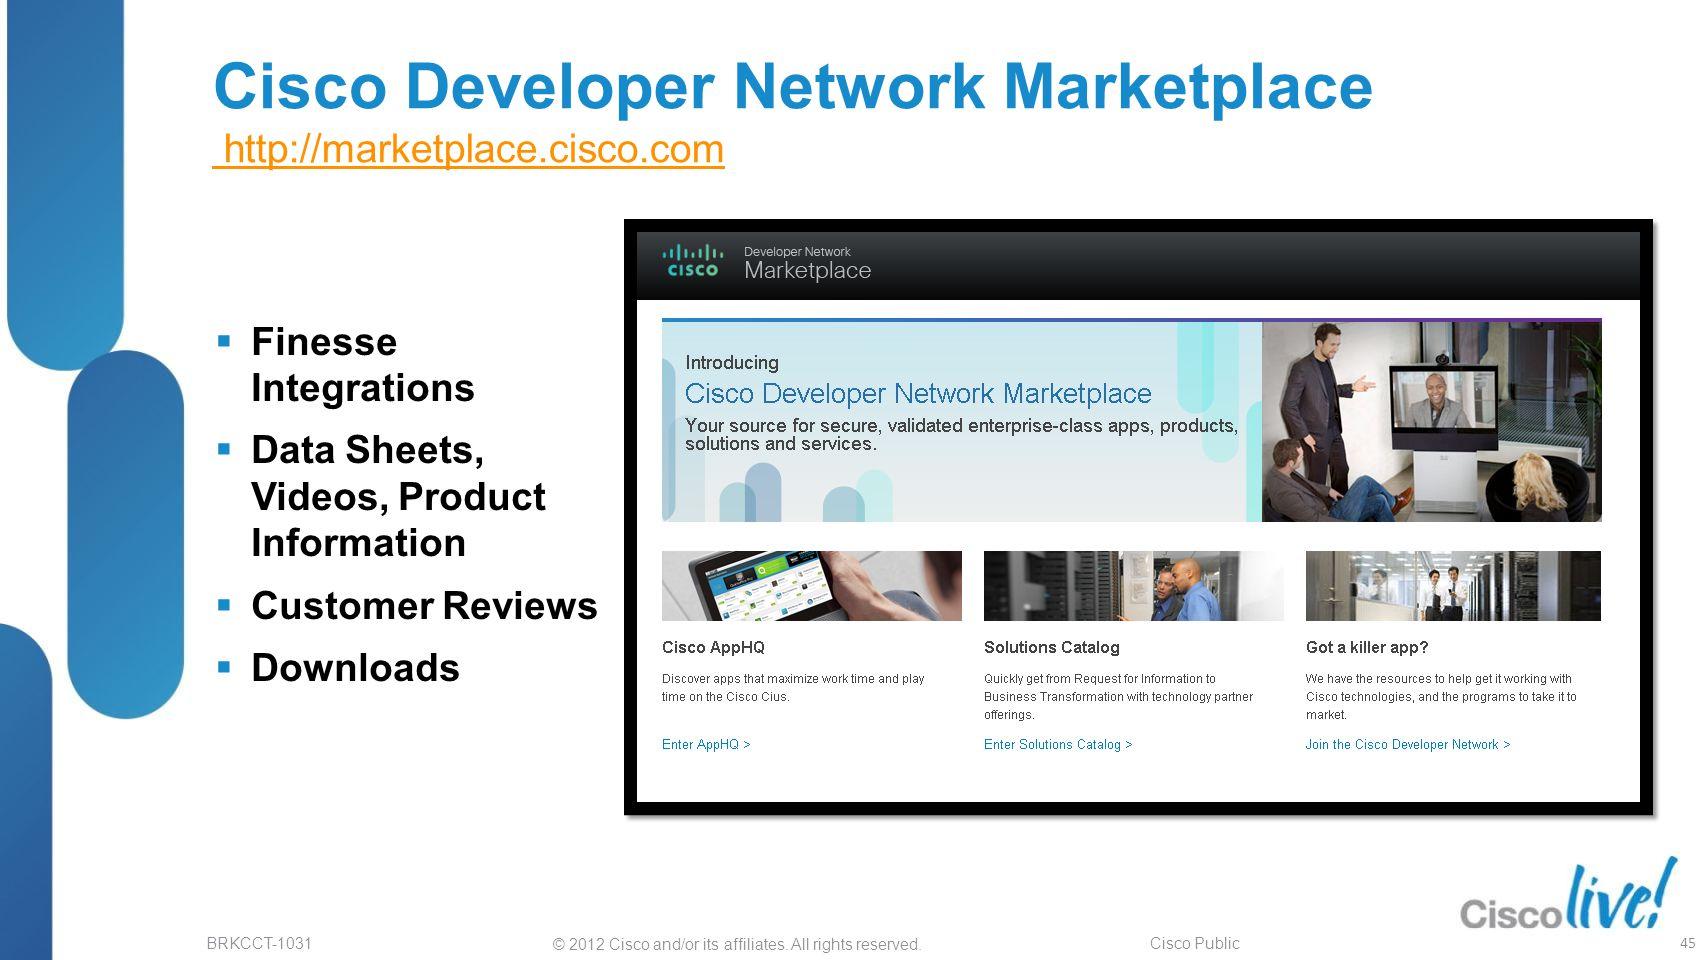 © 2012 Cisco and/or its affiliates. All rights reserved. BRKCCT-1031 Cisco Public Cisco Developer Network Marketplace http://marketplace.cisco.com htt